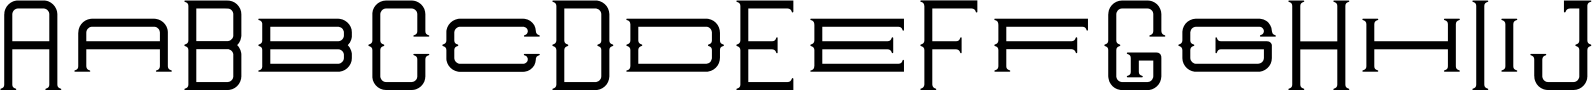 Monogram Forge 1